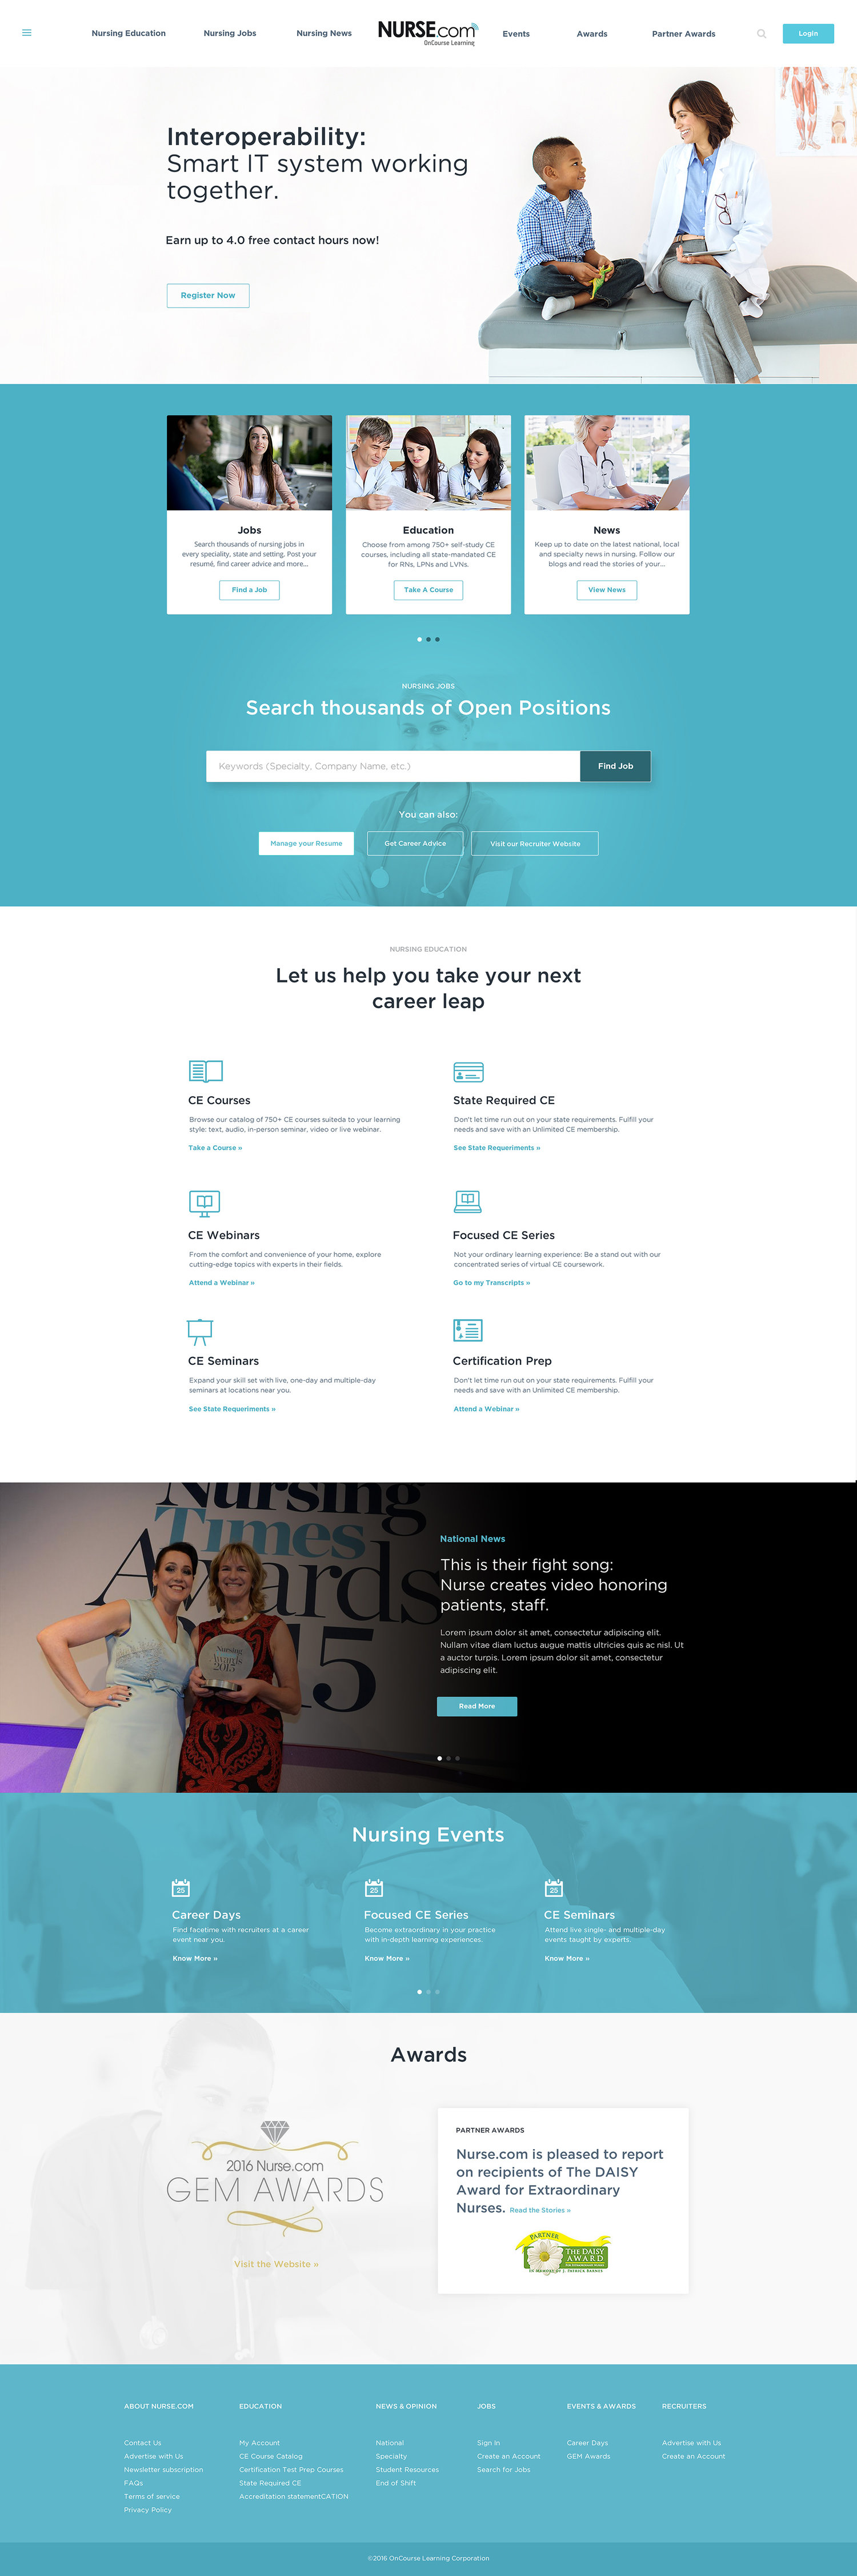 Web Design | Nurse.com - Homepage (Desktop View)